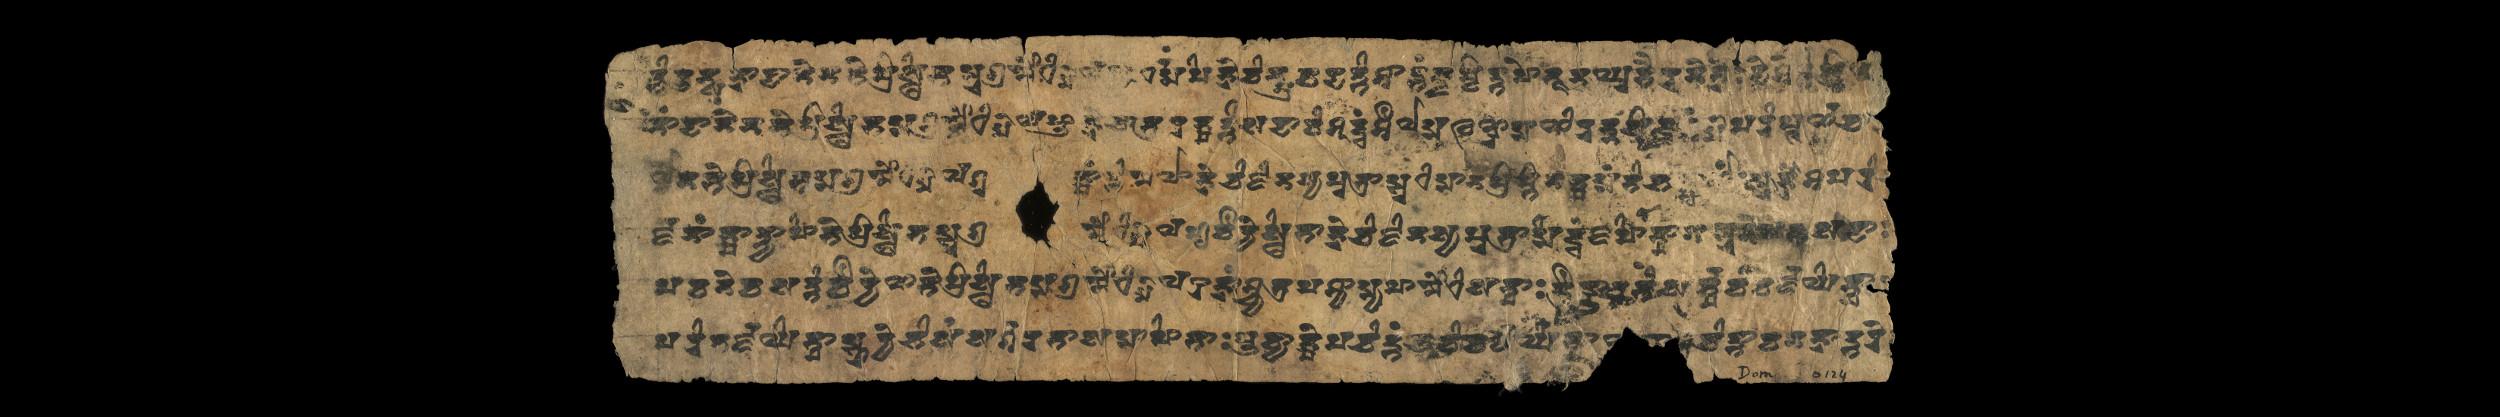 Lotus_Sutra_in_South_Turkestan_Brahmi_script